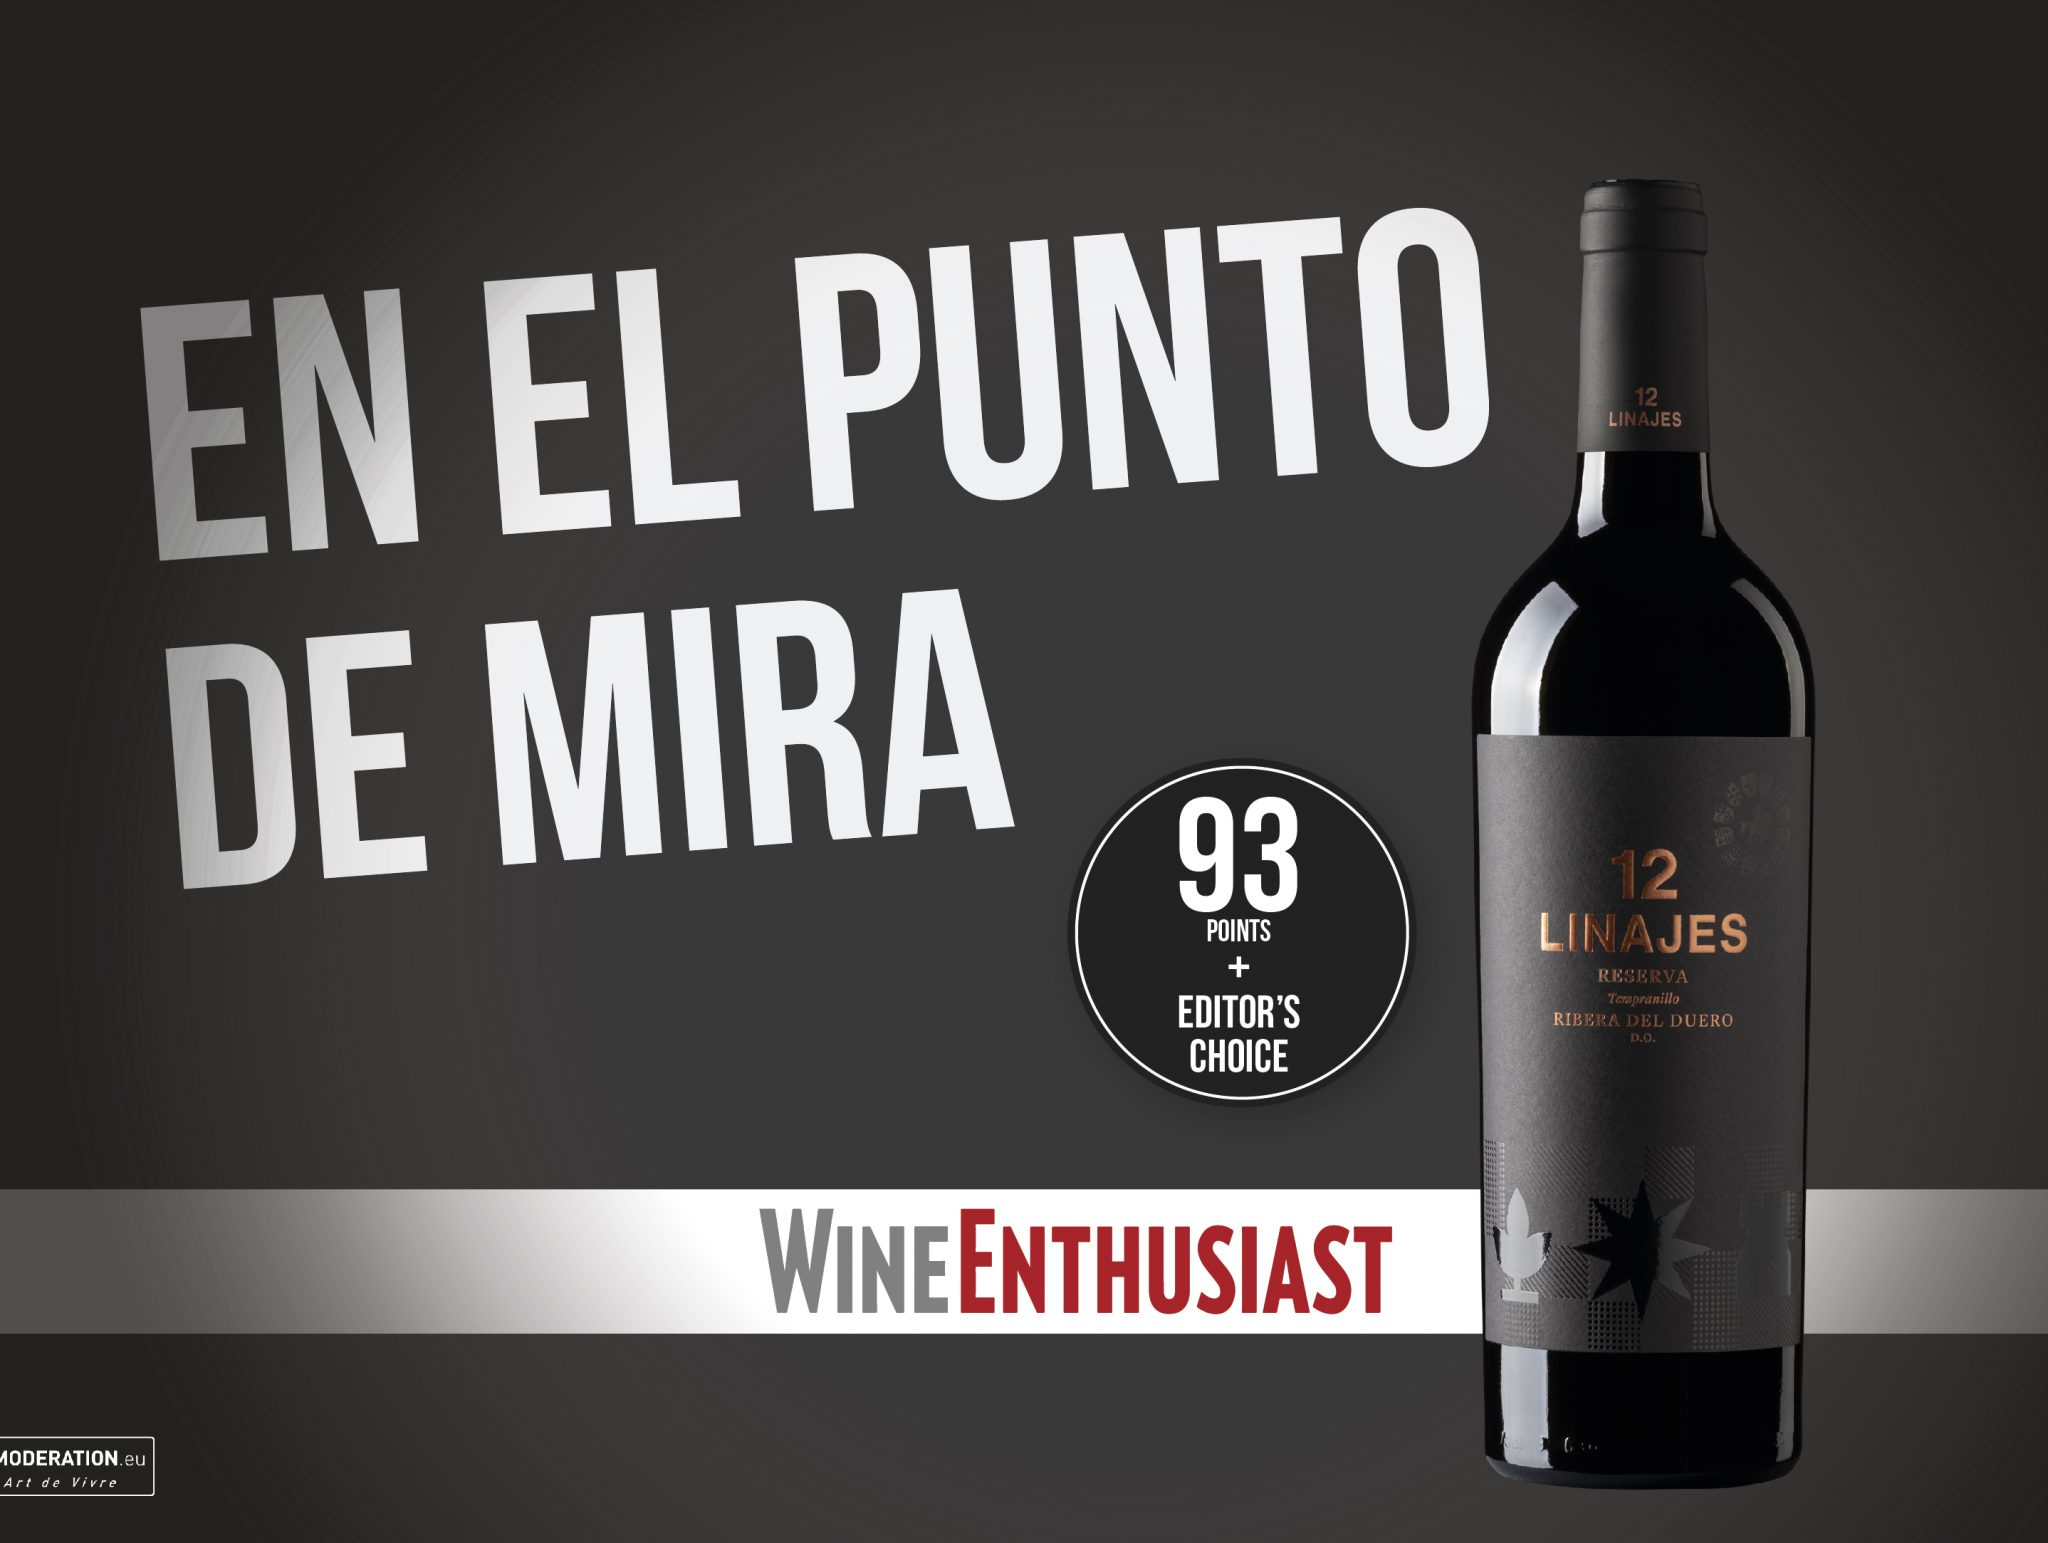 12 linajes Reserva, el vino TOP de la revista Wine Enthusiast